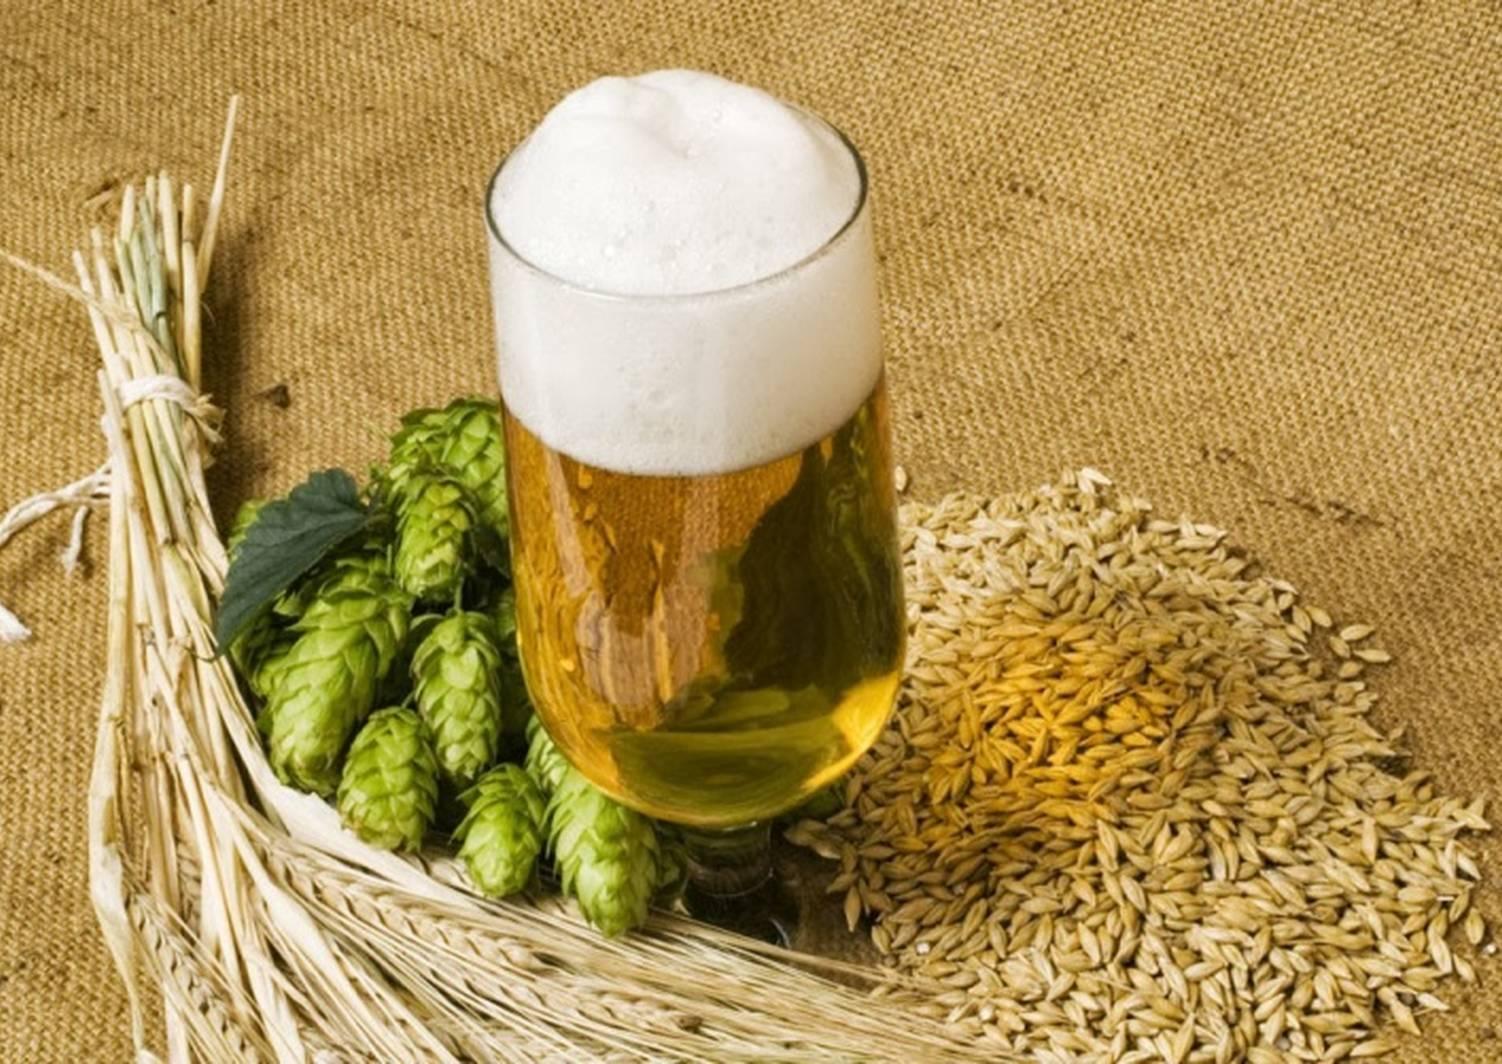 Пиво из хмеля в домашних условиях